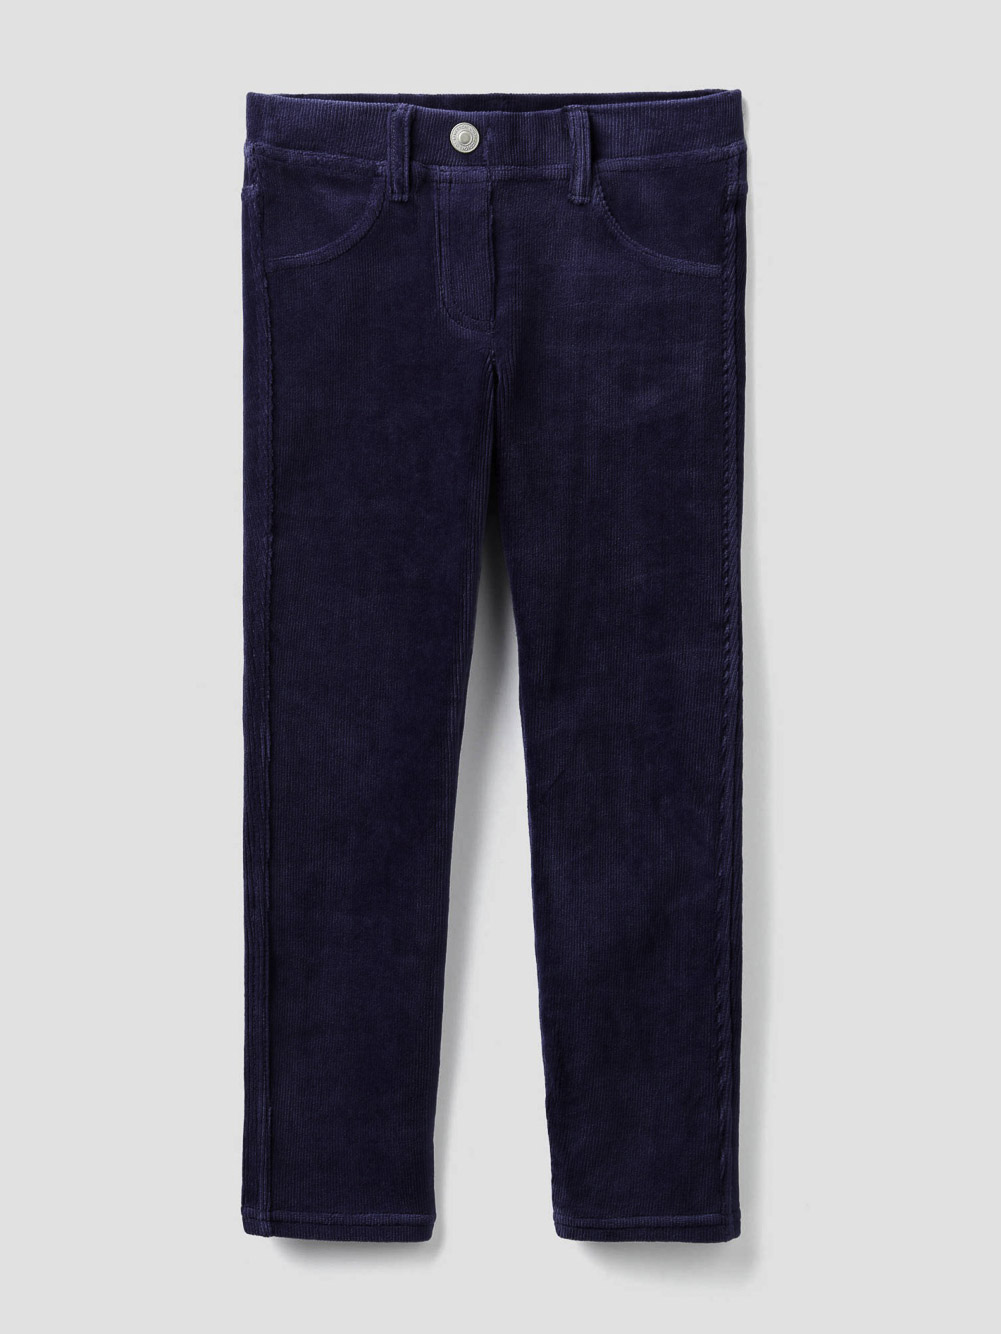 012 BENETTON Παντελόνι super skinny 4DZB57LZ0 20A252